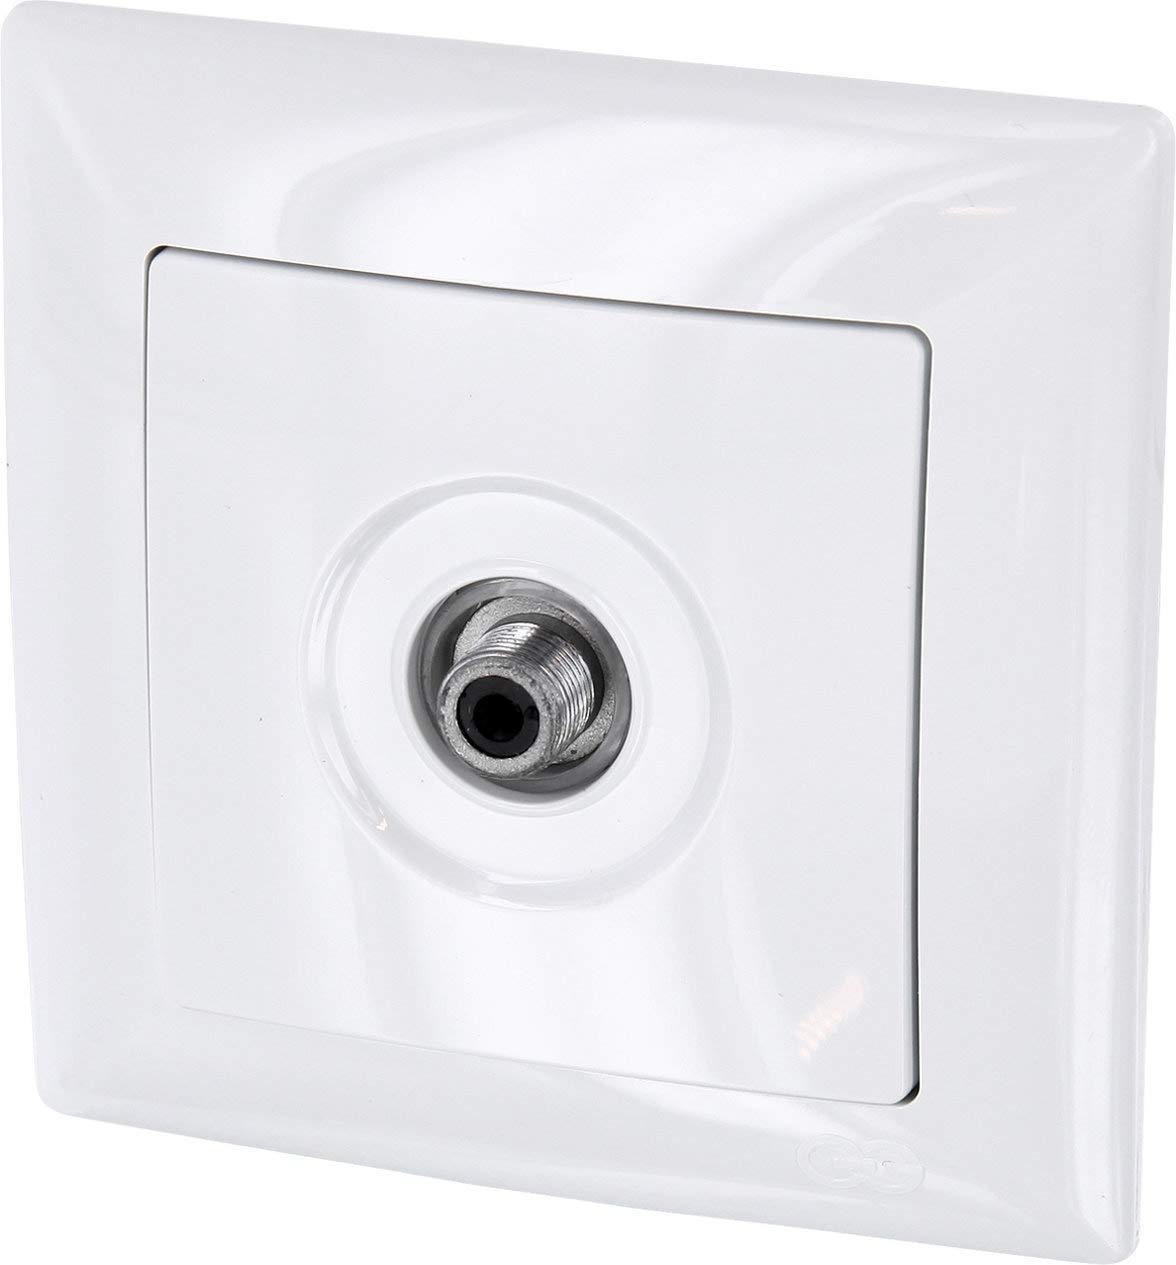 Enchufe para antena saté lite de 1 orificio (conector F), multiusos, marco + montaje enrasado + protector (serie G1 de color blanco) multiusos marco + montaje enrasado + protector (serie G1de color blanco) HAVA